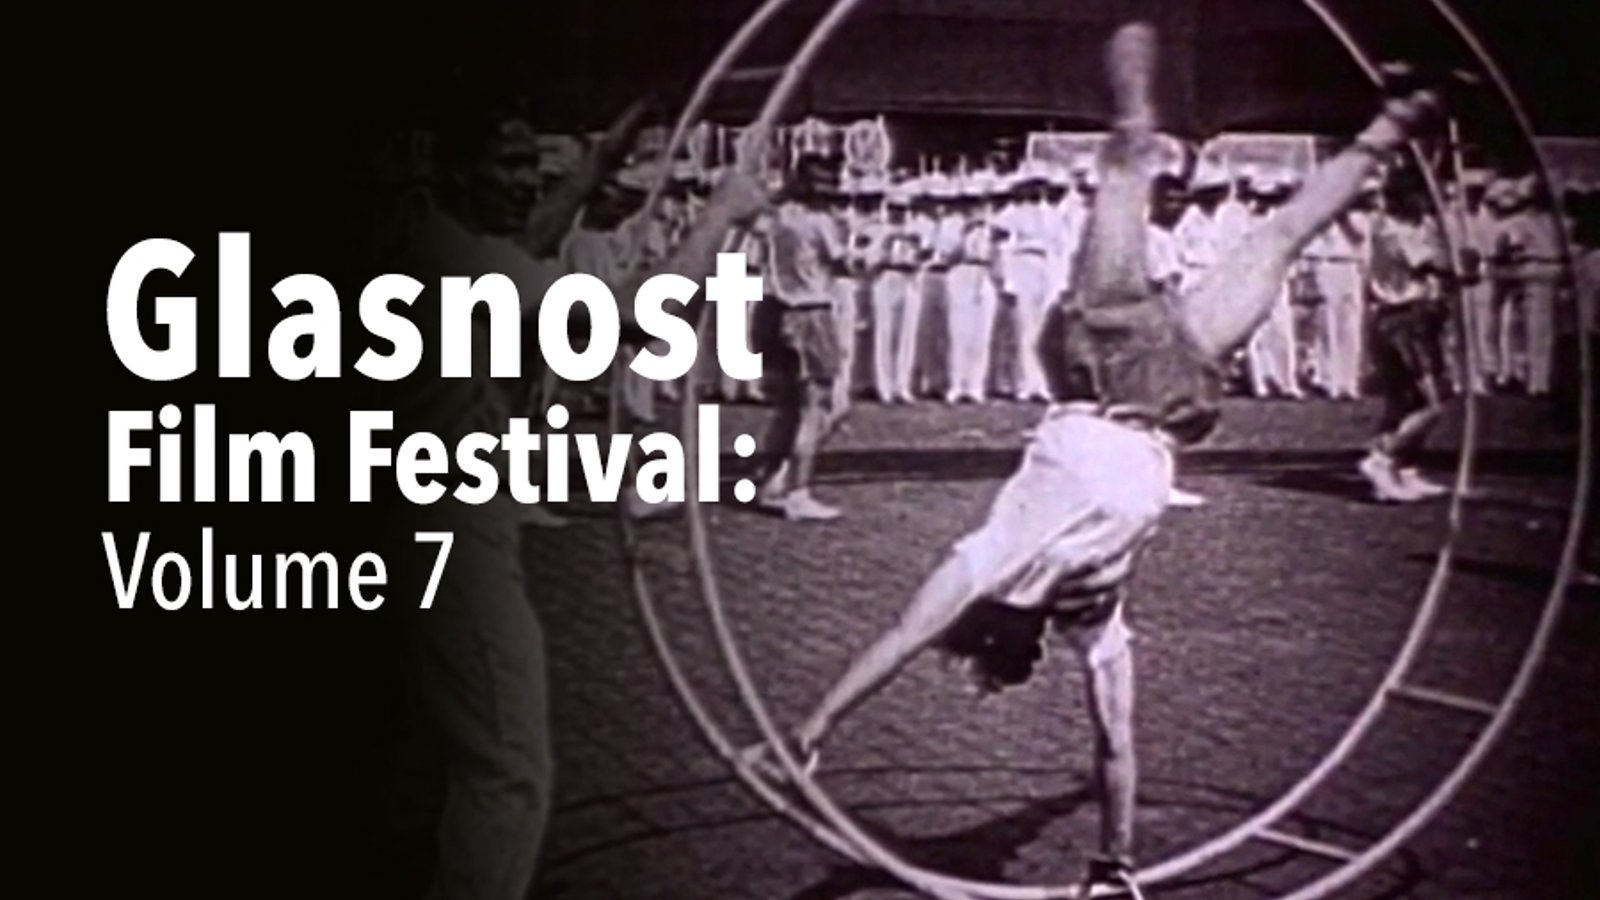 Glasnost Film Festival - Volume 7